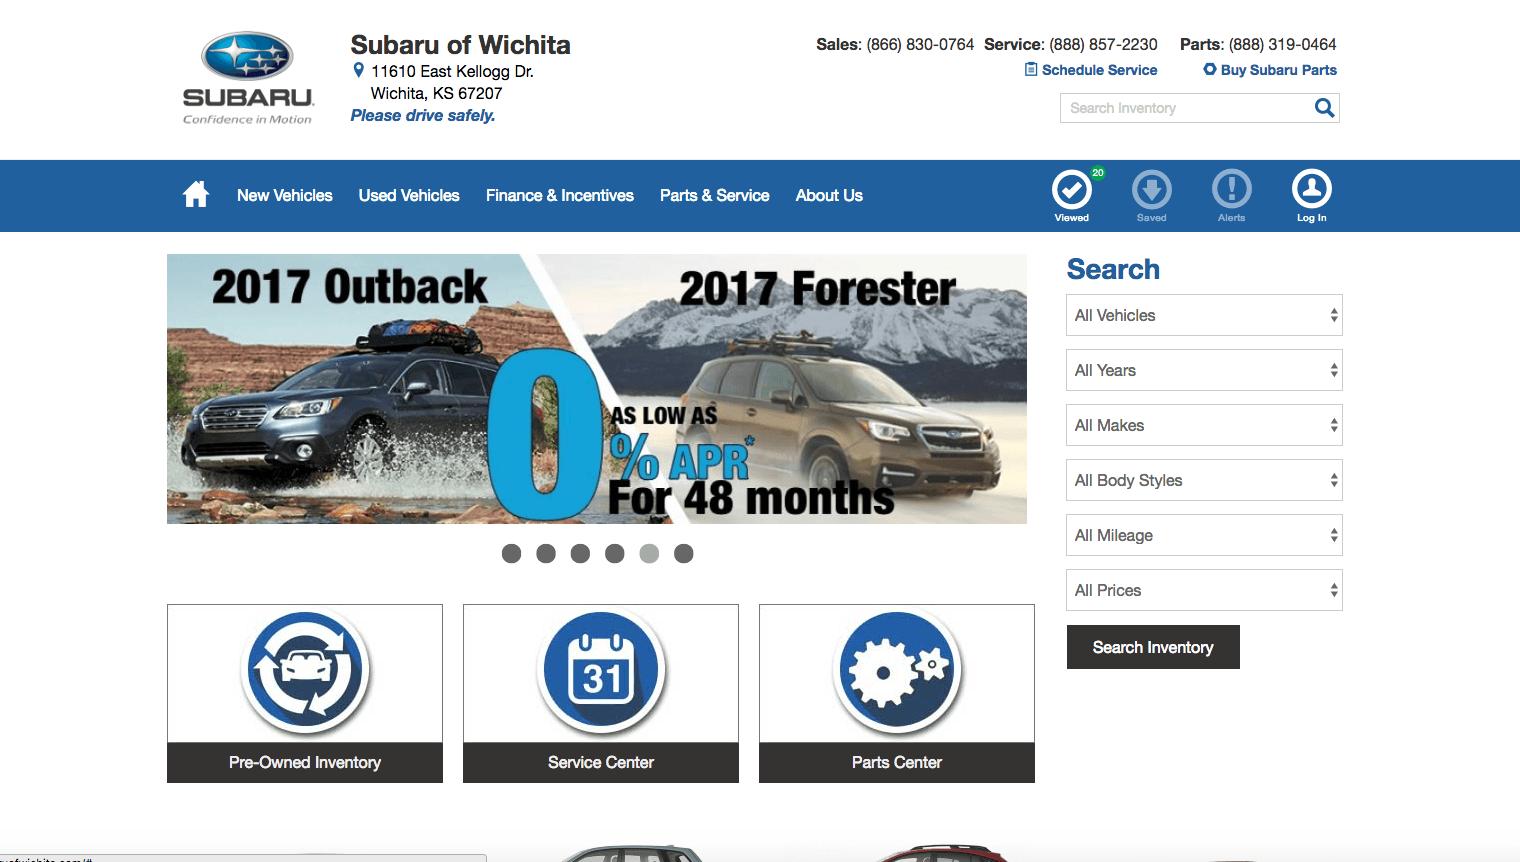 Subaru of Wichita